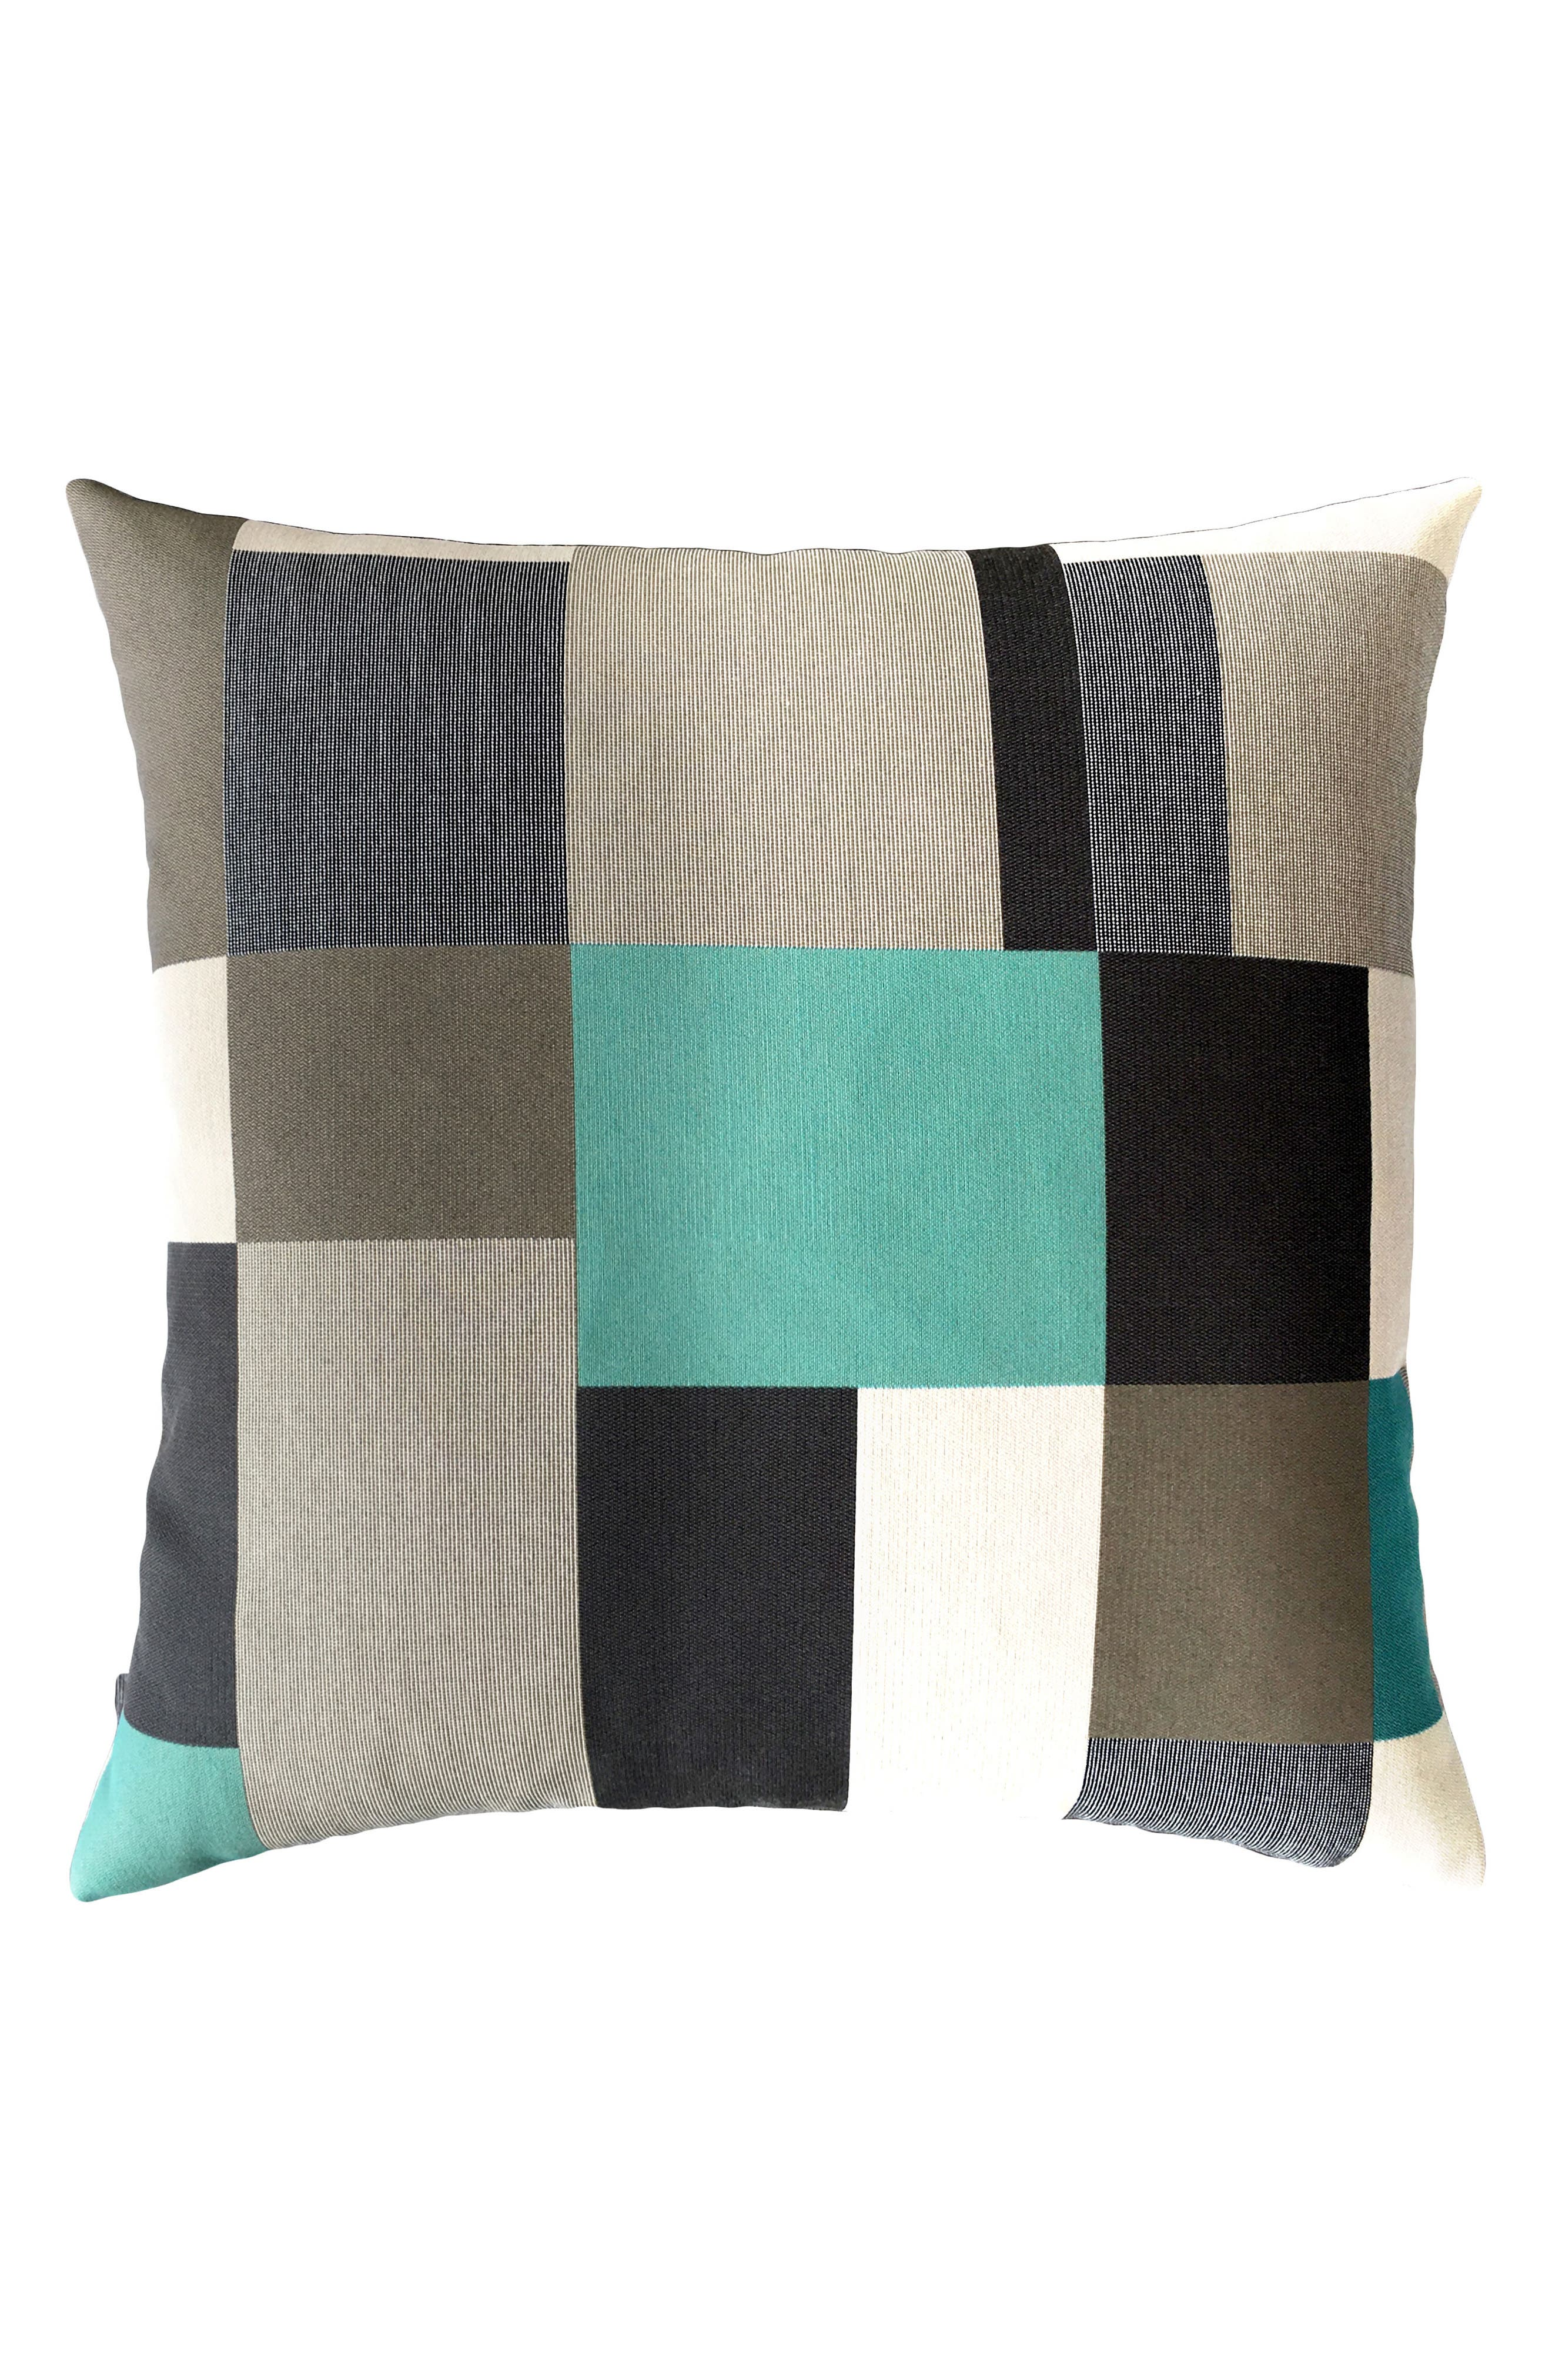 Noir Block Indoor/Outdoor Accent Pillow,                             Main thumbnail 1, color,                             Blue/ Black